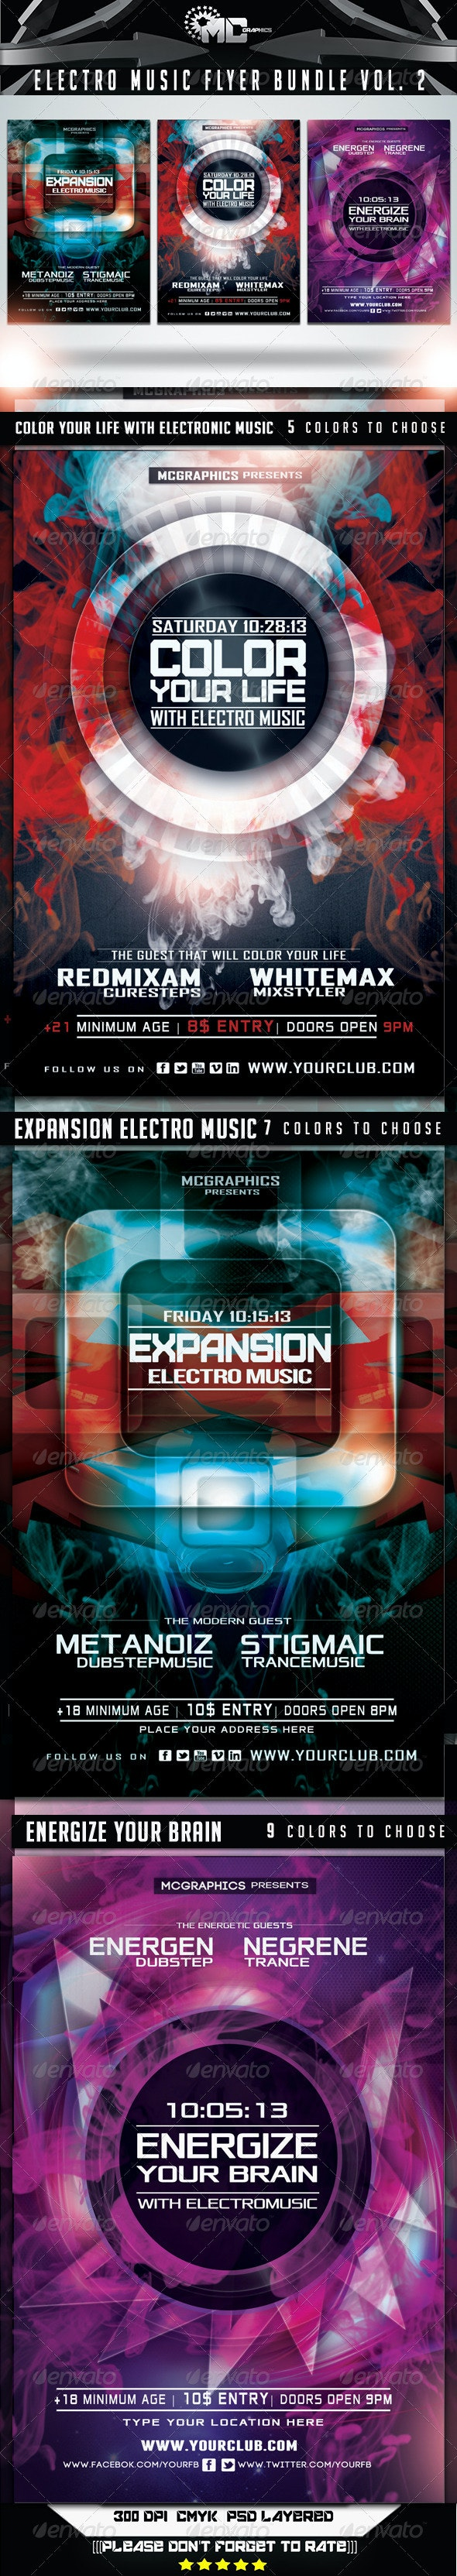 Electro Music Flyer Bundle Vol. 2 - Flyers Print Templates